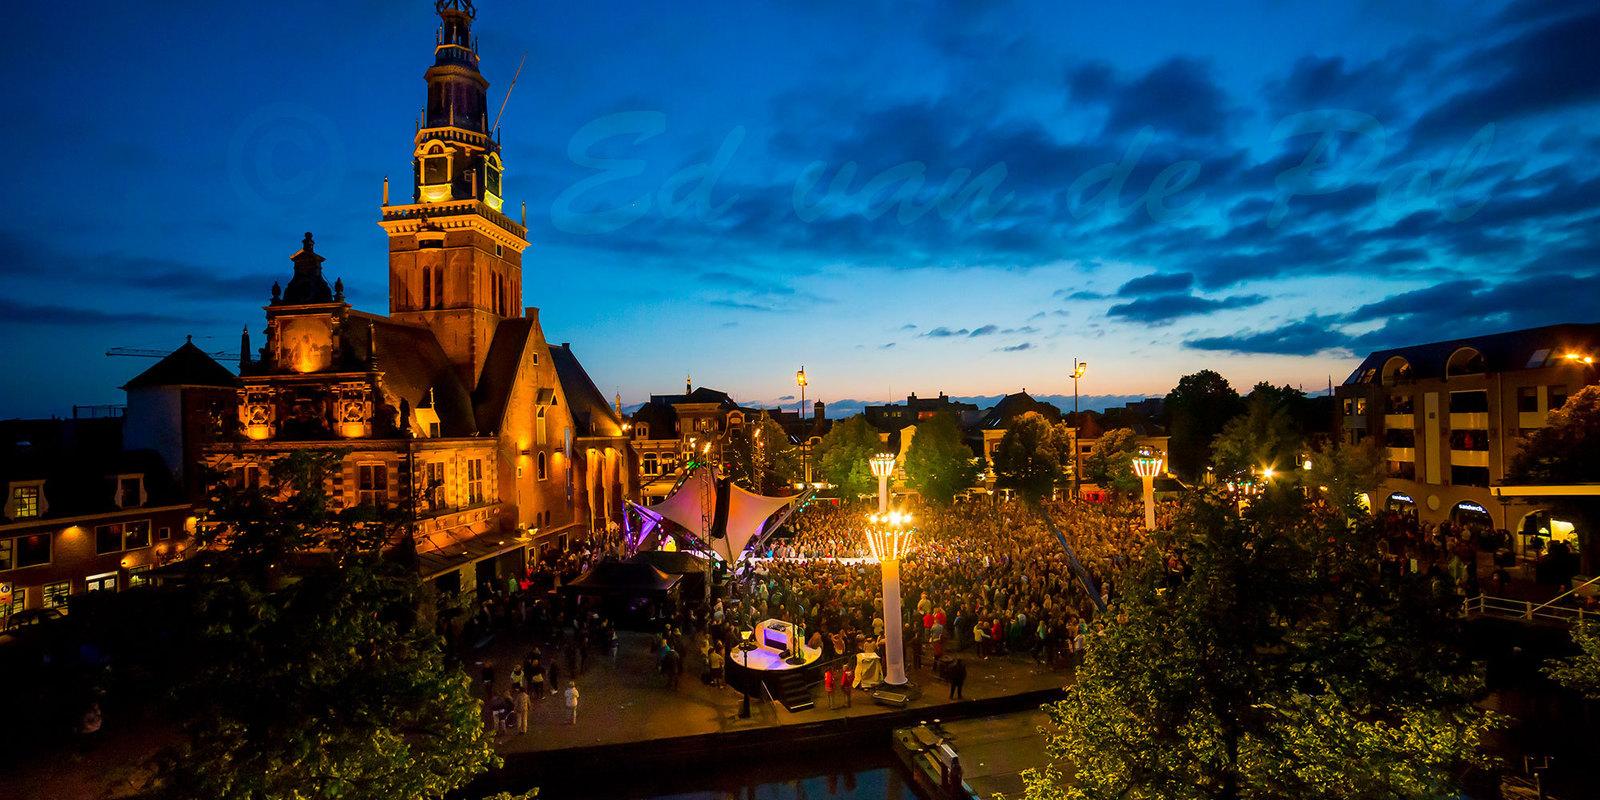 Alkmaar city holland - 2 7